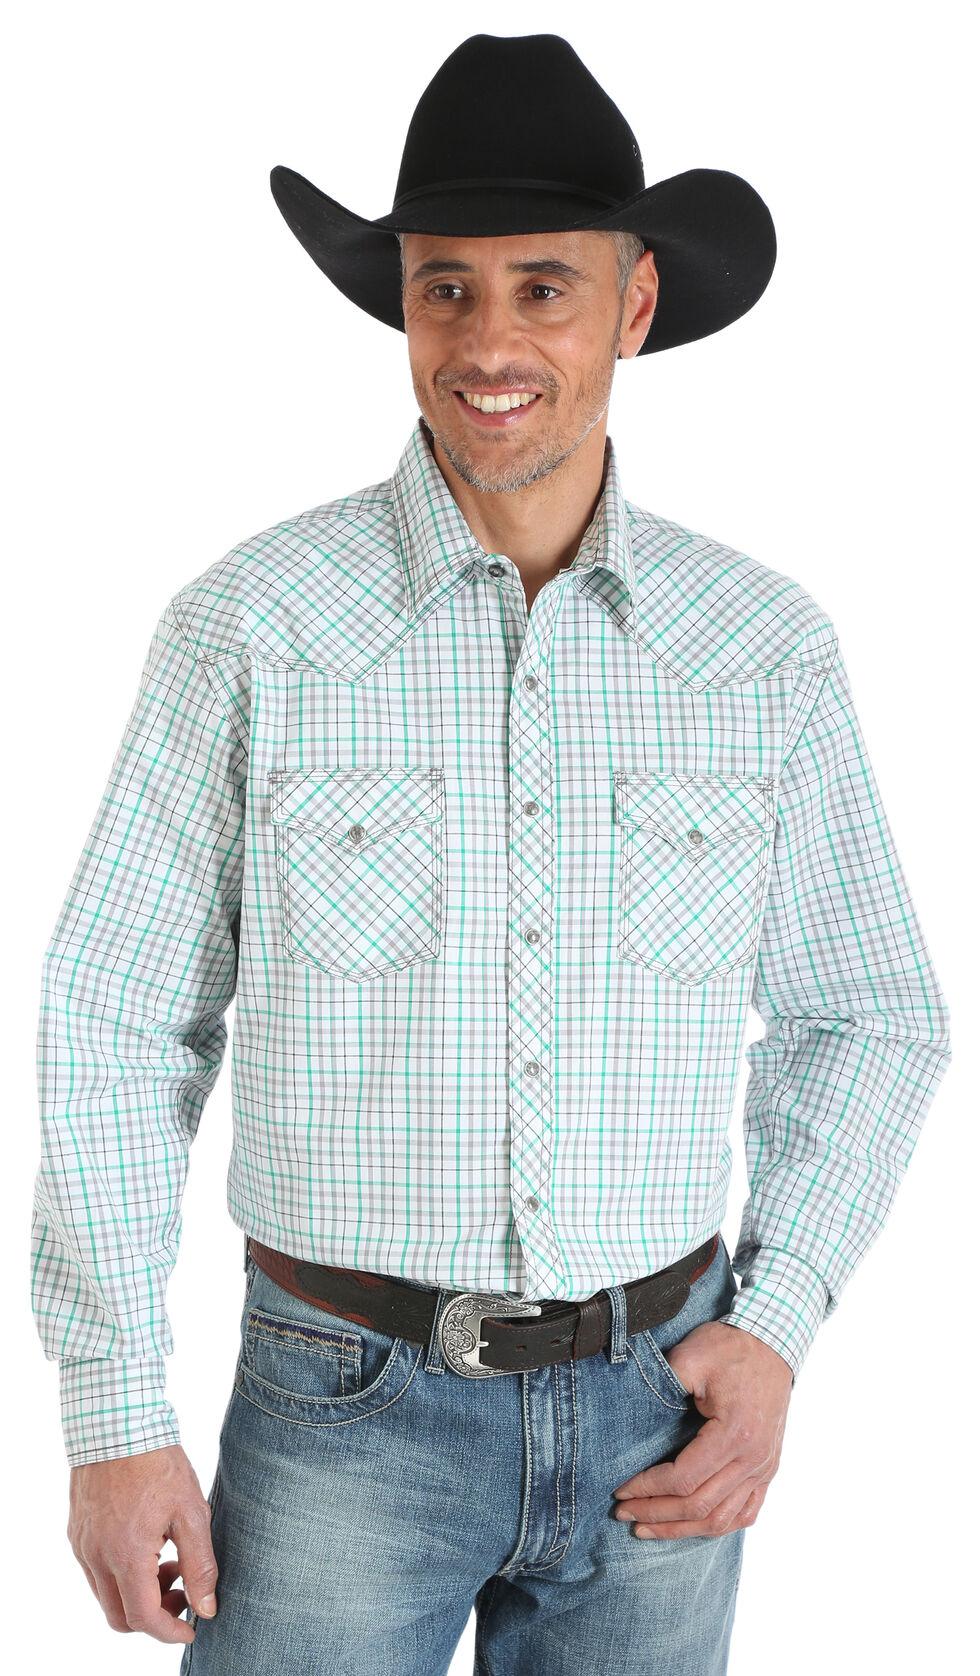 Wrangler 20X Men's White/Green Competition Advanced Comfort Snap Shirt - Big & Tall, Green, hi-res